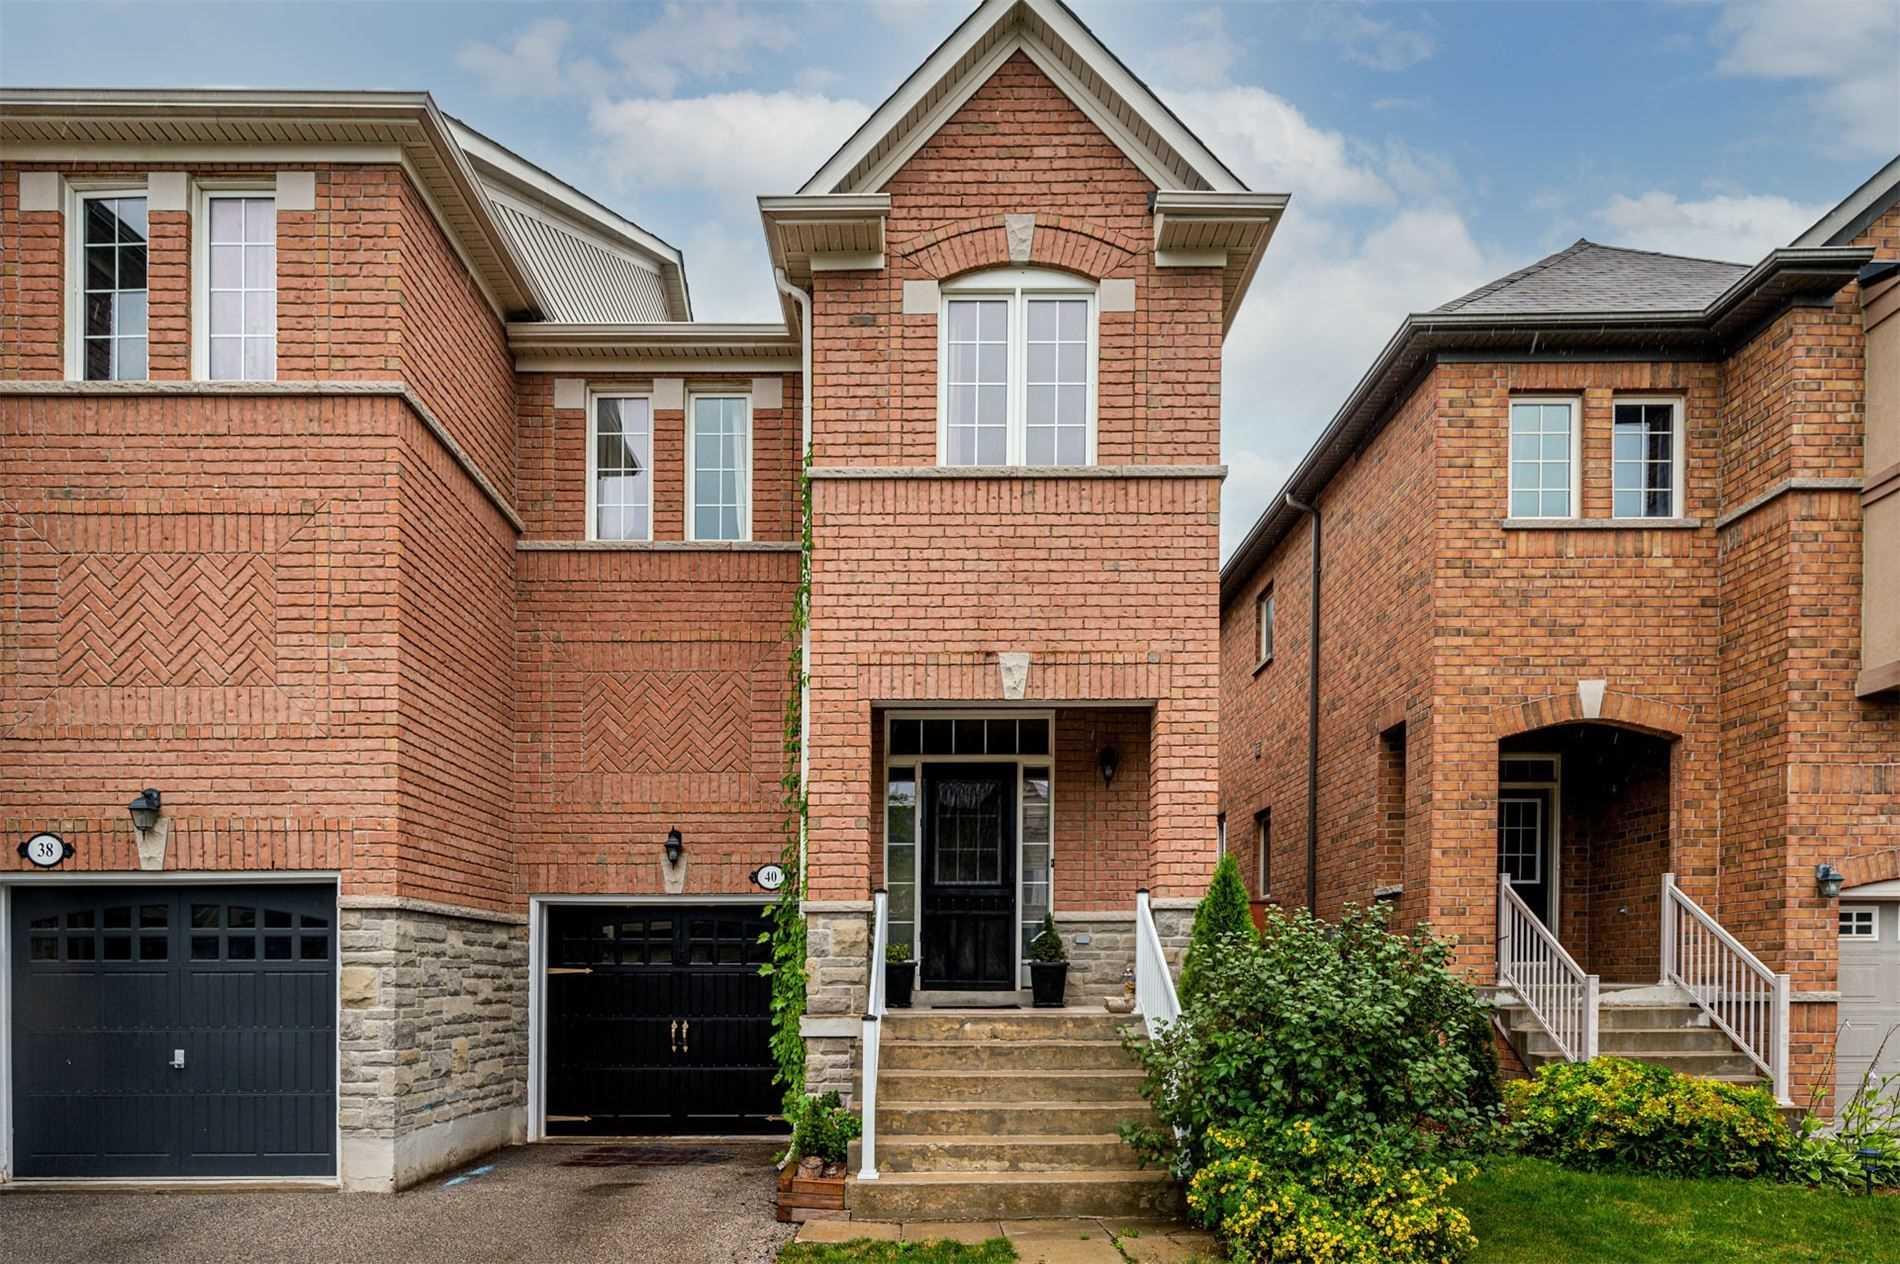 40 Gosnel Circ - Bradford Att/Row/Twnhouse for sale, 3 Bedrooms (N5324025) - #1